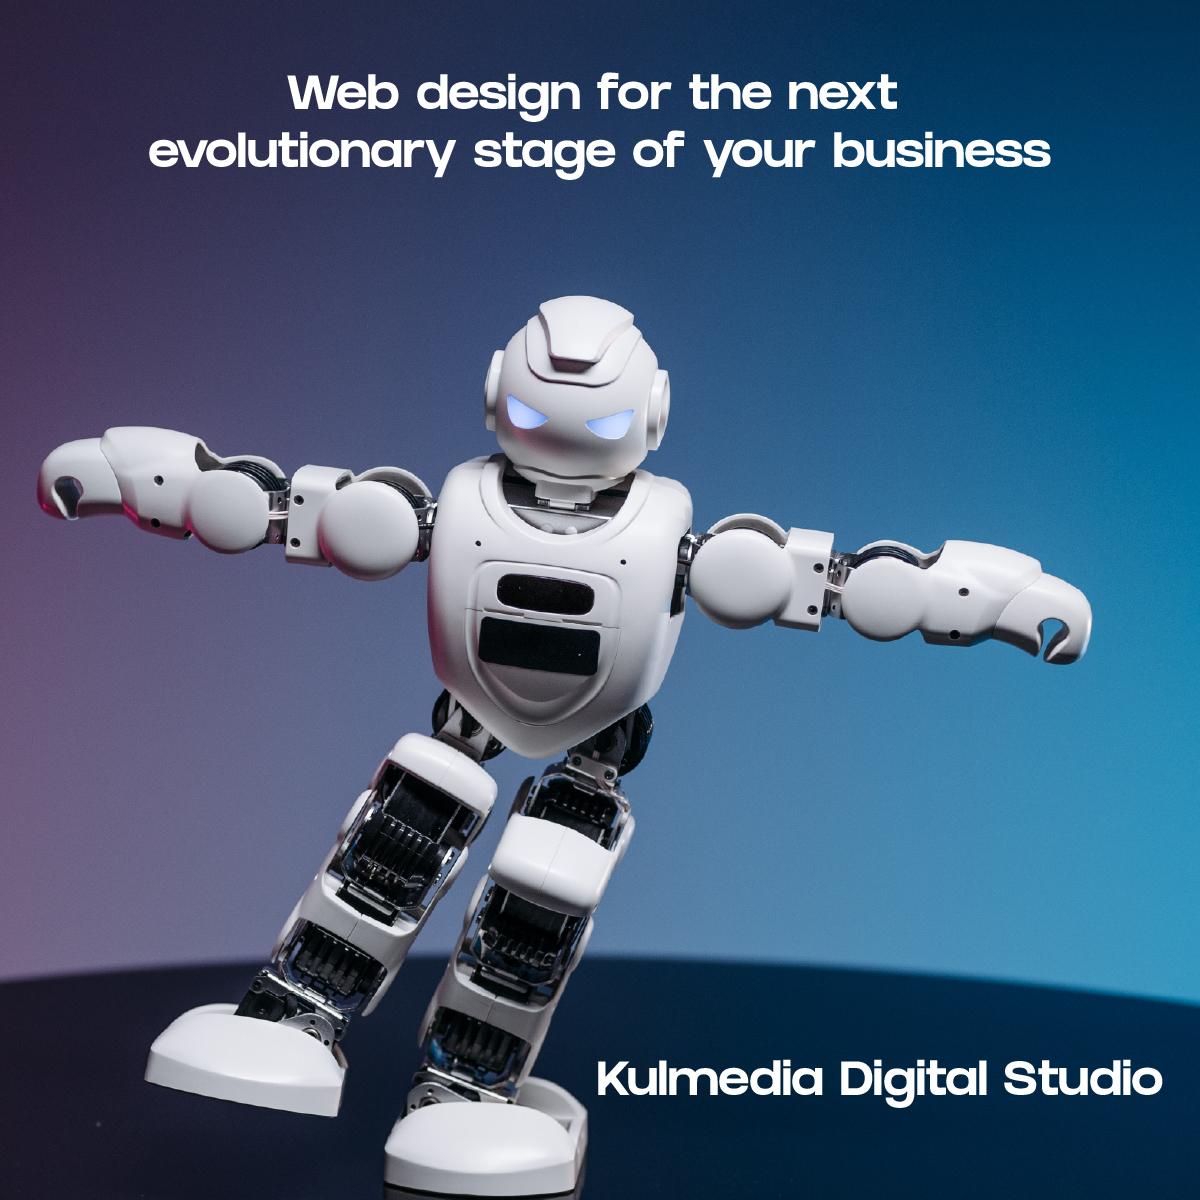 Web Design by Kulmedia Digital Studio